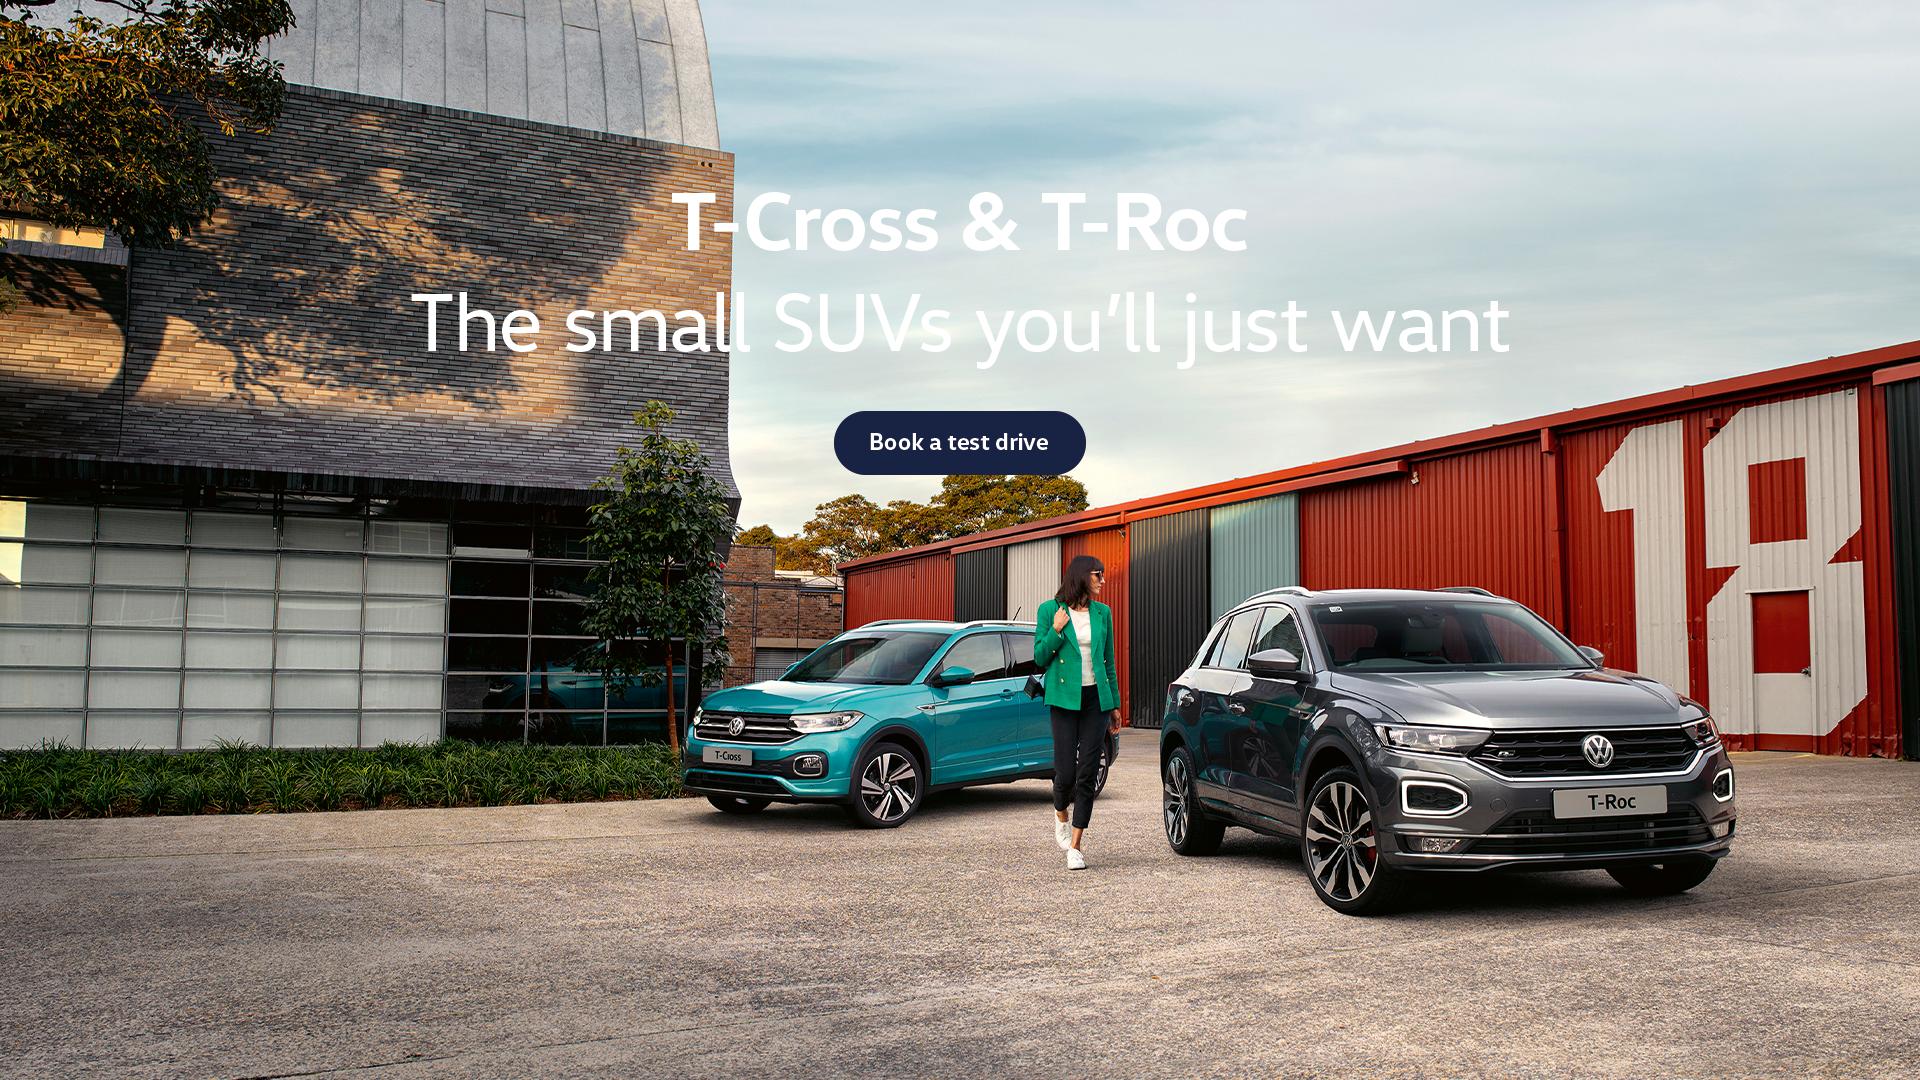 Volkswagen Small SUV range. Test drive today at Gold Coast Volkswagen